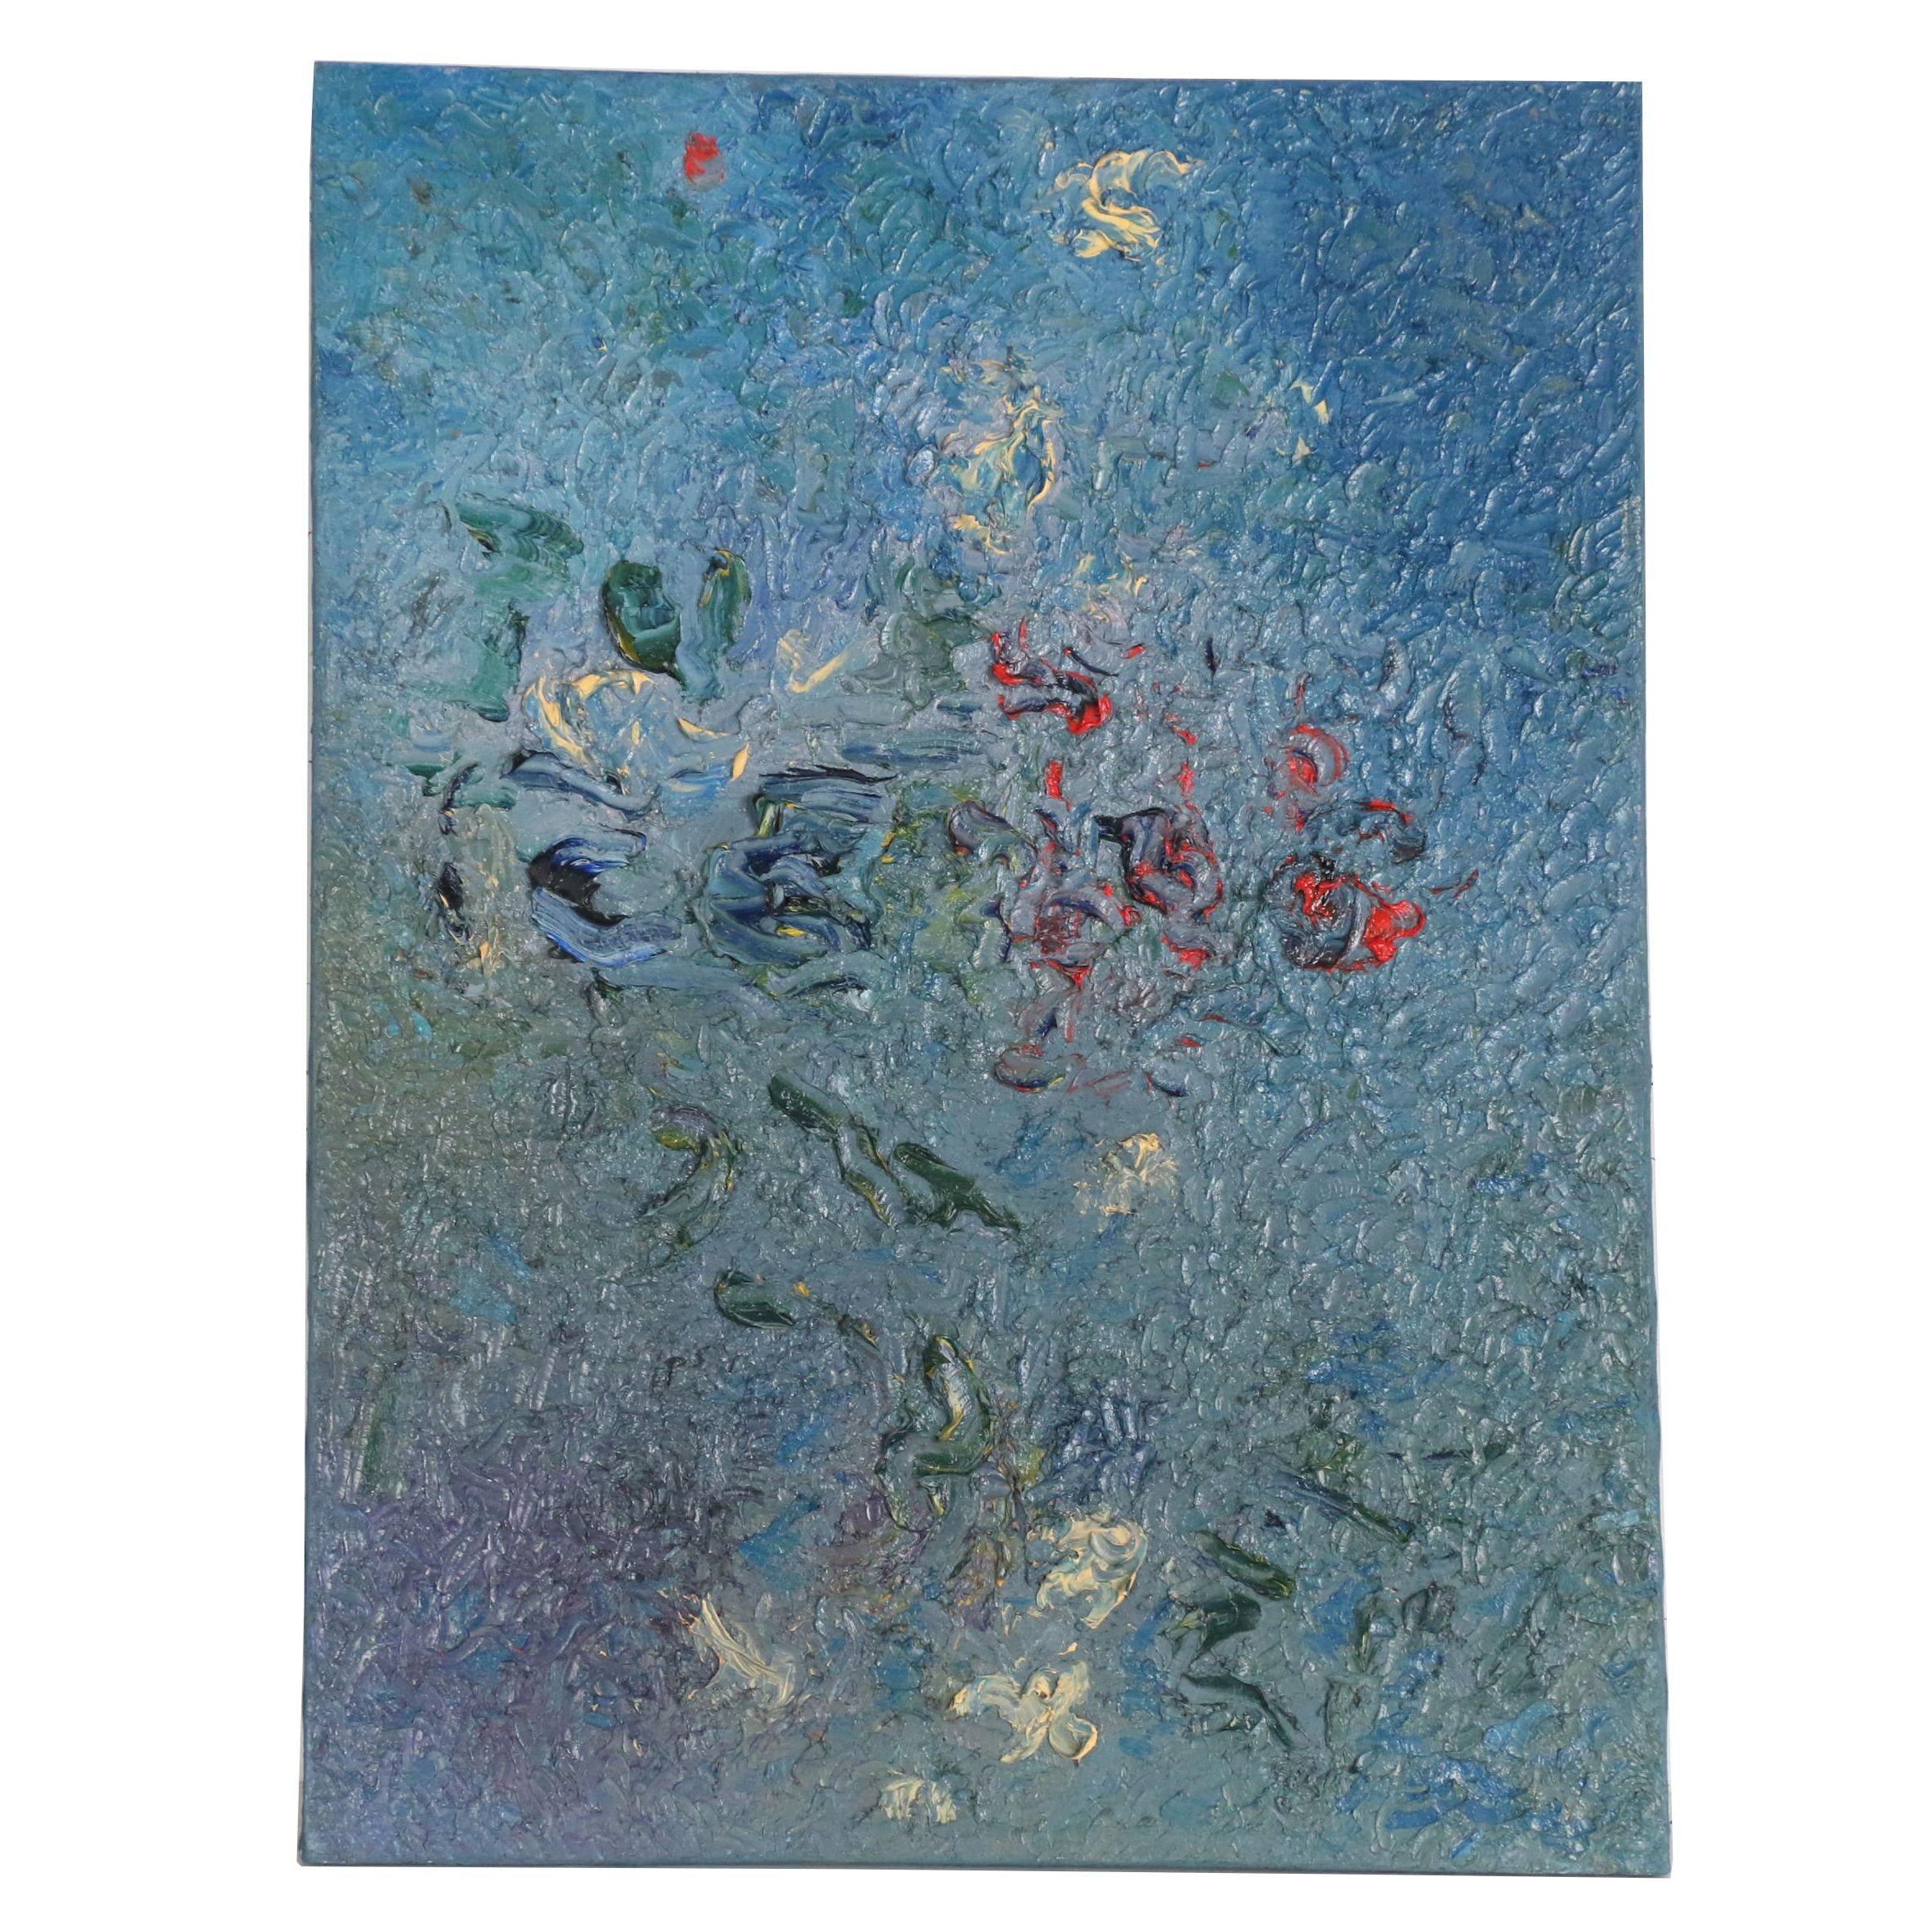 Louis Papp 1991 Oil Painting